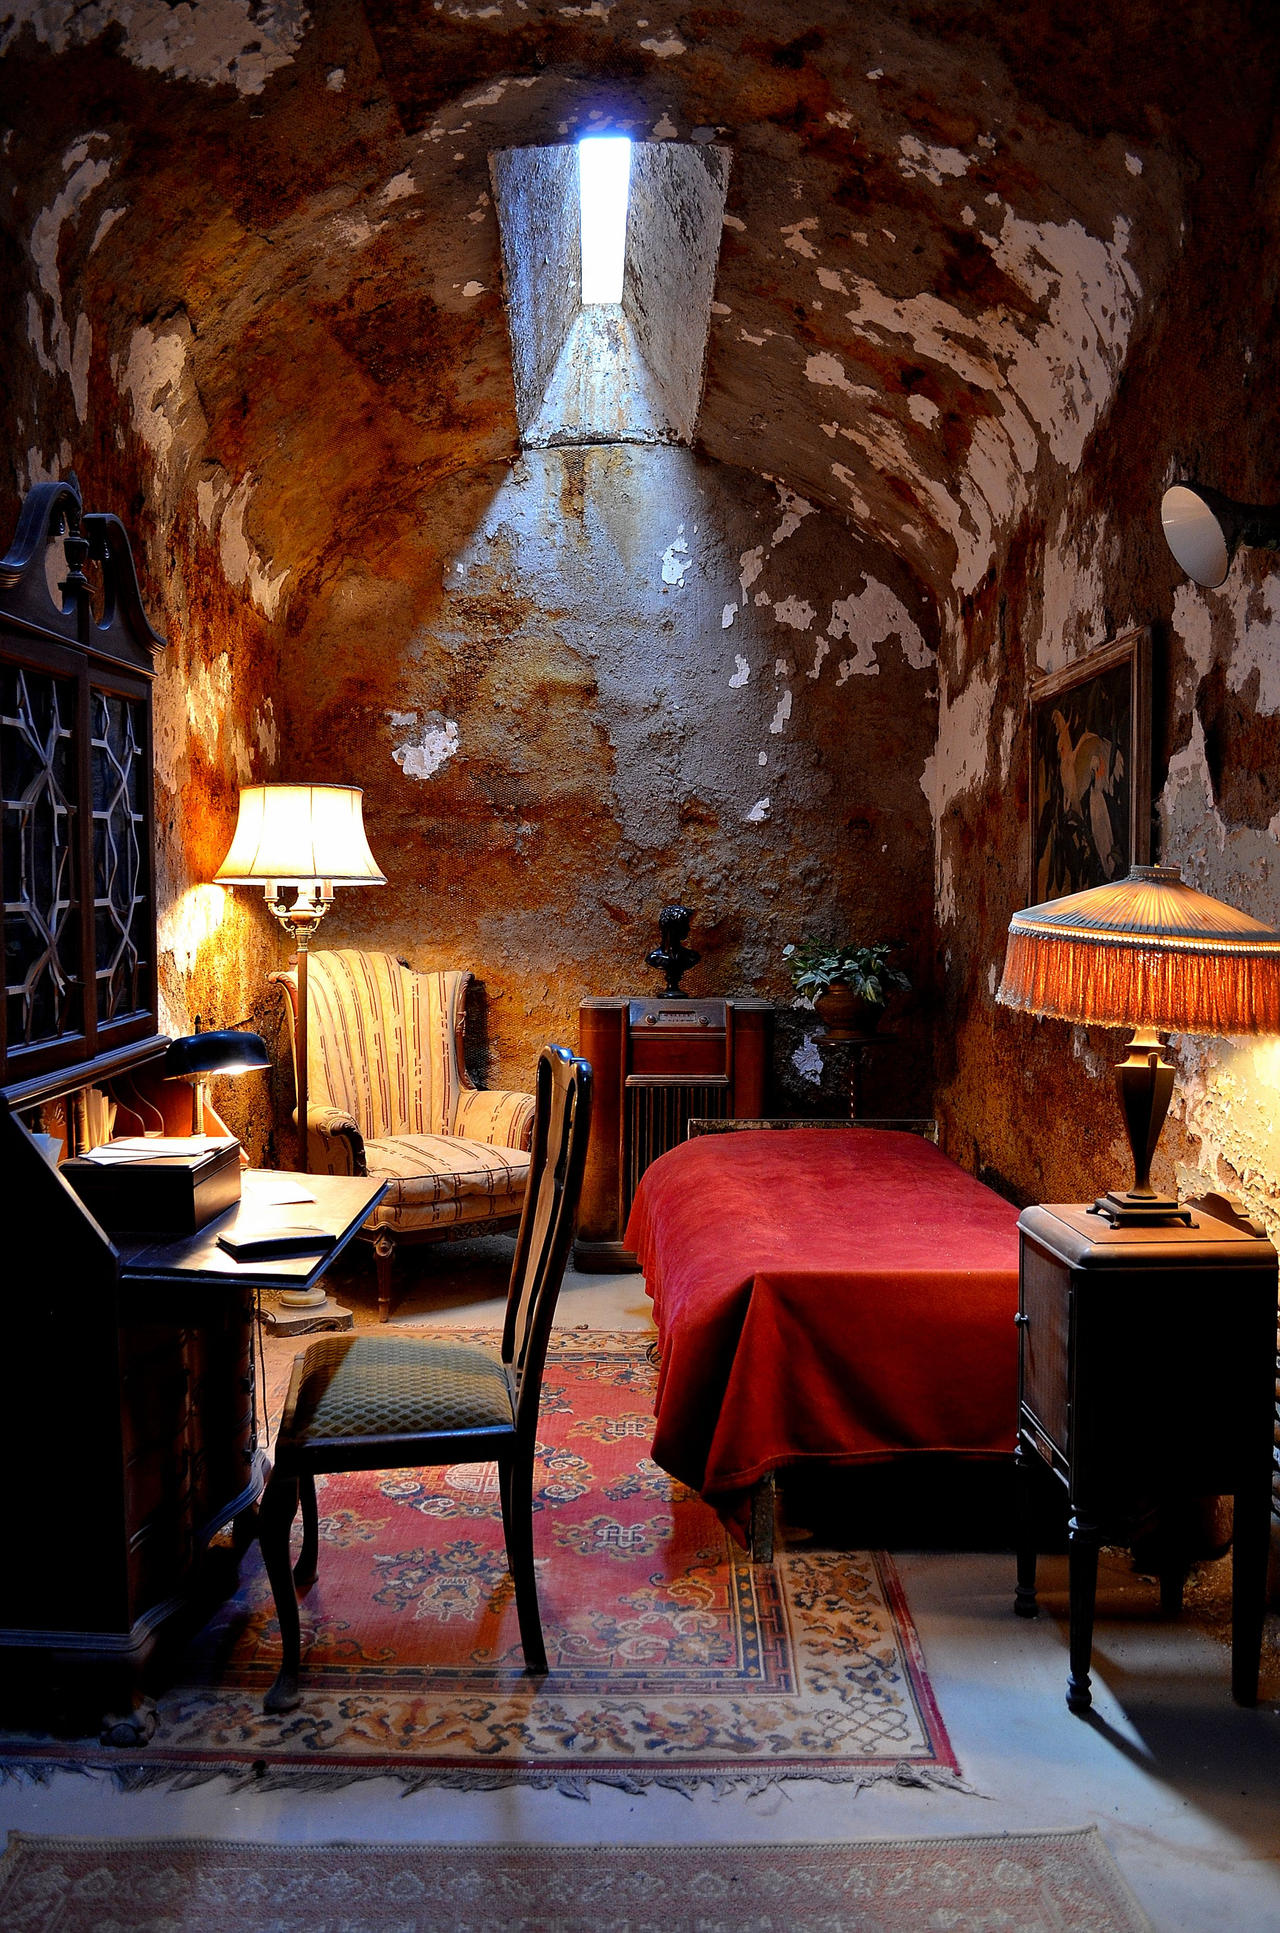 AL Capone's Cell (Inside) by PAlisauskas